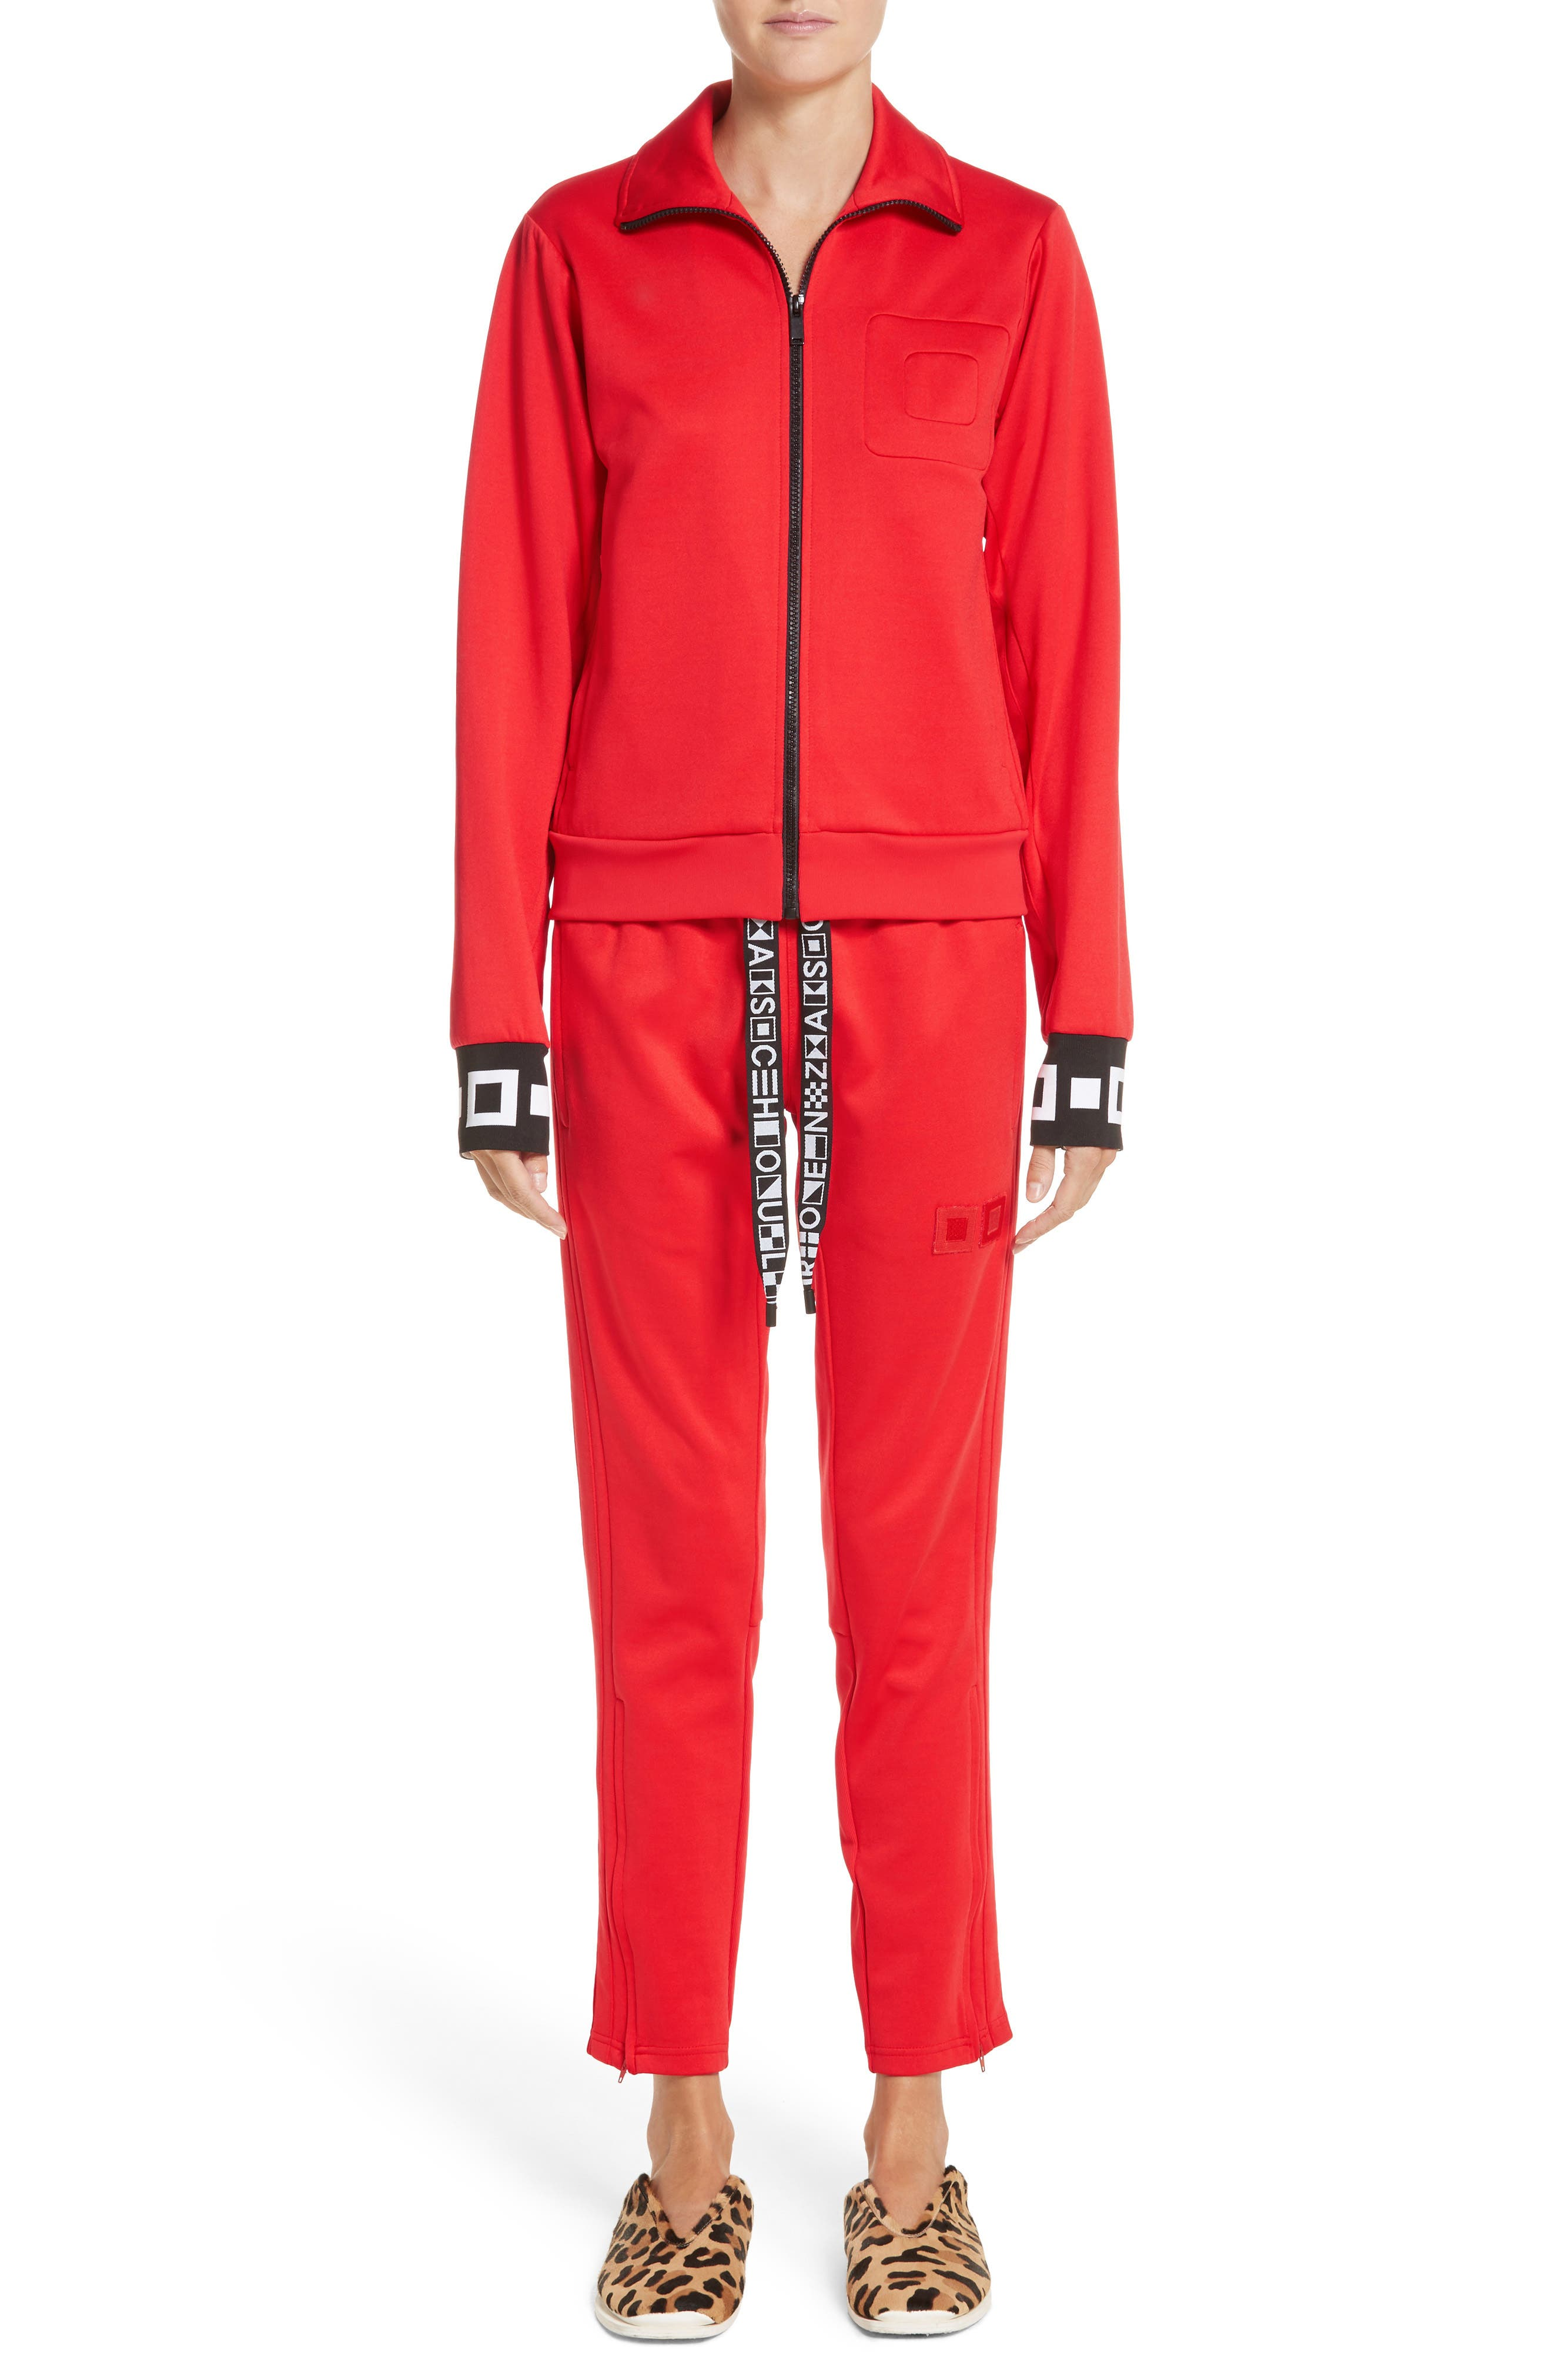 PSWL Jersey Track Pants,                             Alternate thumbnail 2, color,                             Poppy